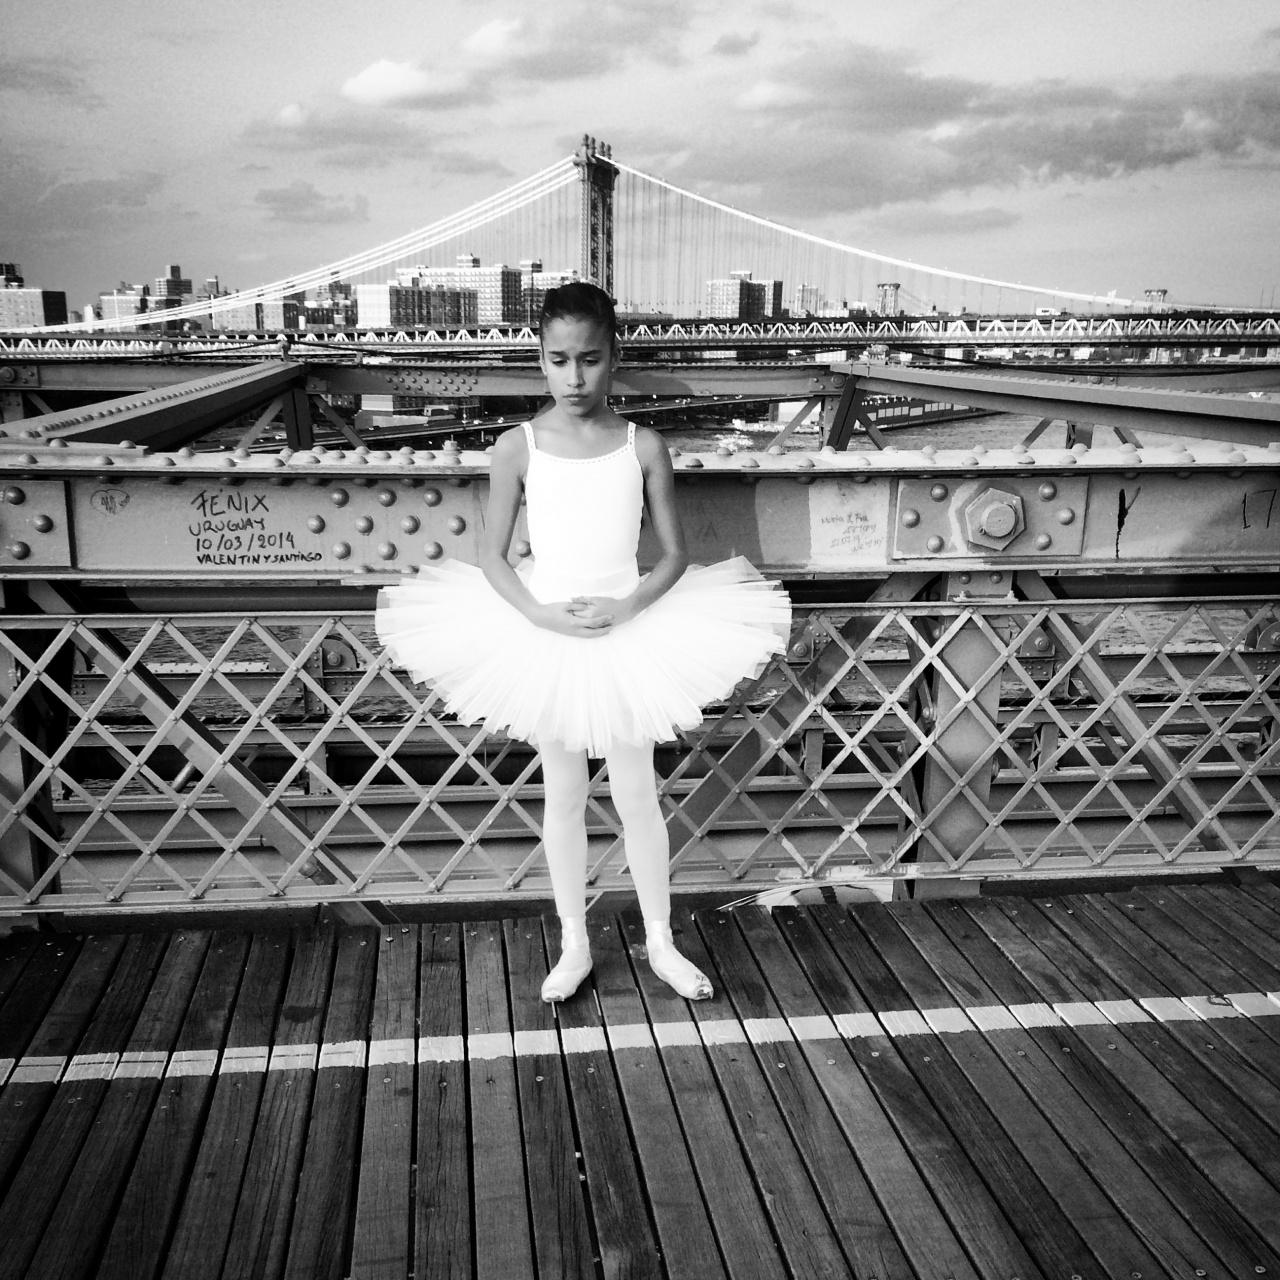 Ballerina Brooklyn Bridge